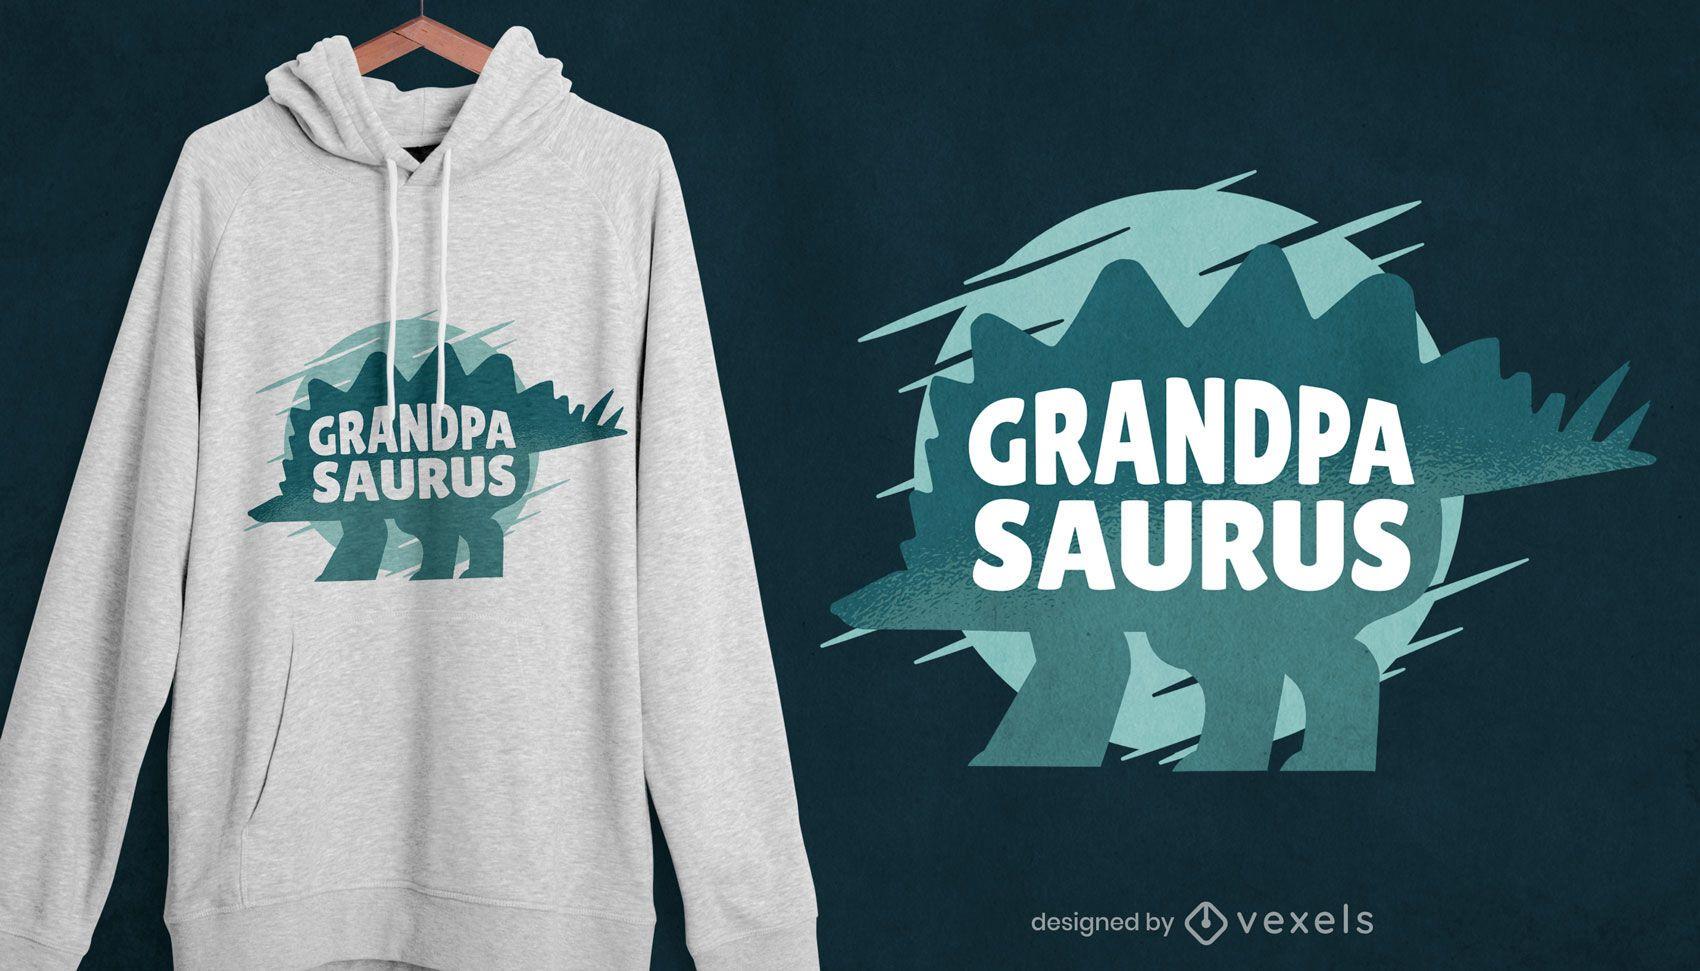 Grandpa saurus t-shirt design